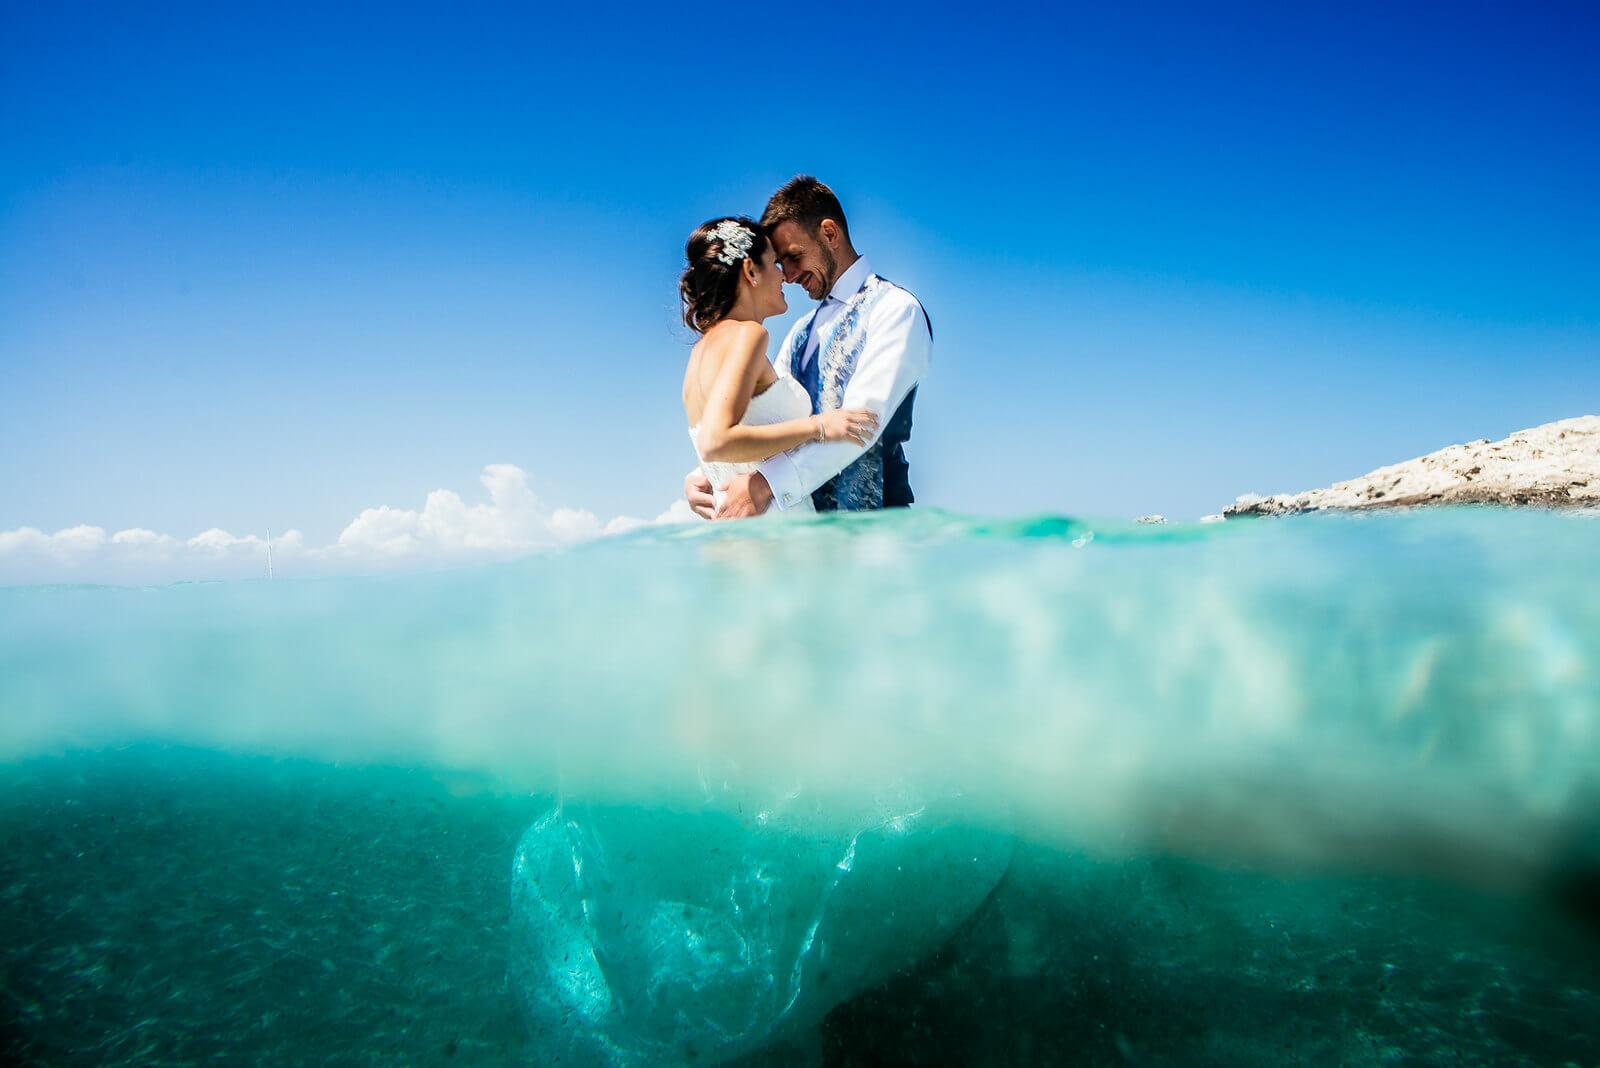 https://www.white-ibiza.com/wp-content/uploads/2020/03/white-ibiza-weddings-dario-sanz-photography-2020-12-1.jpg